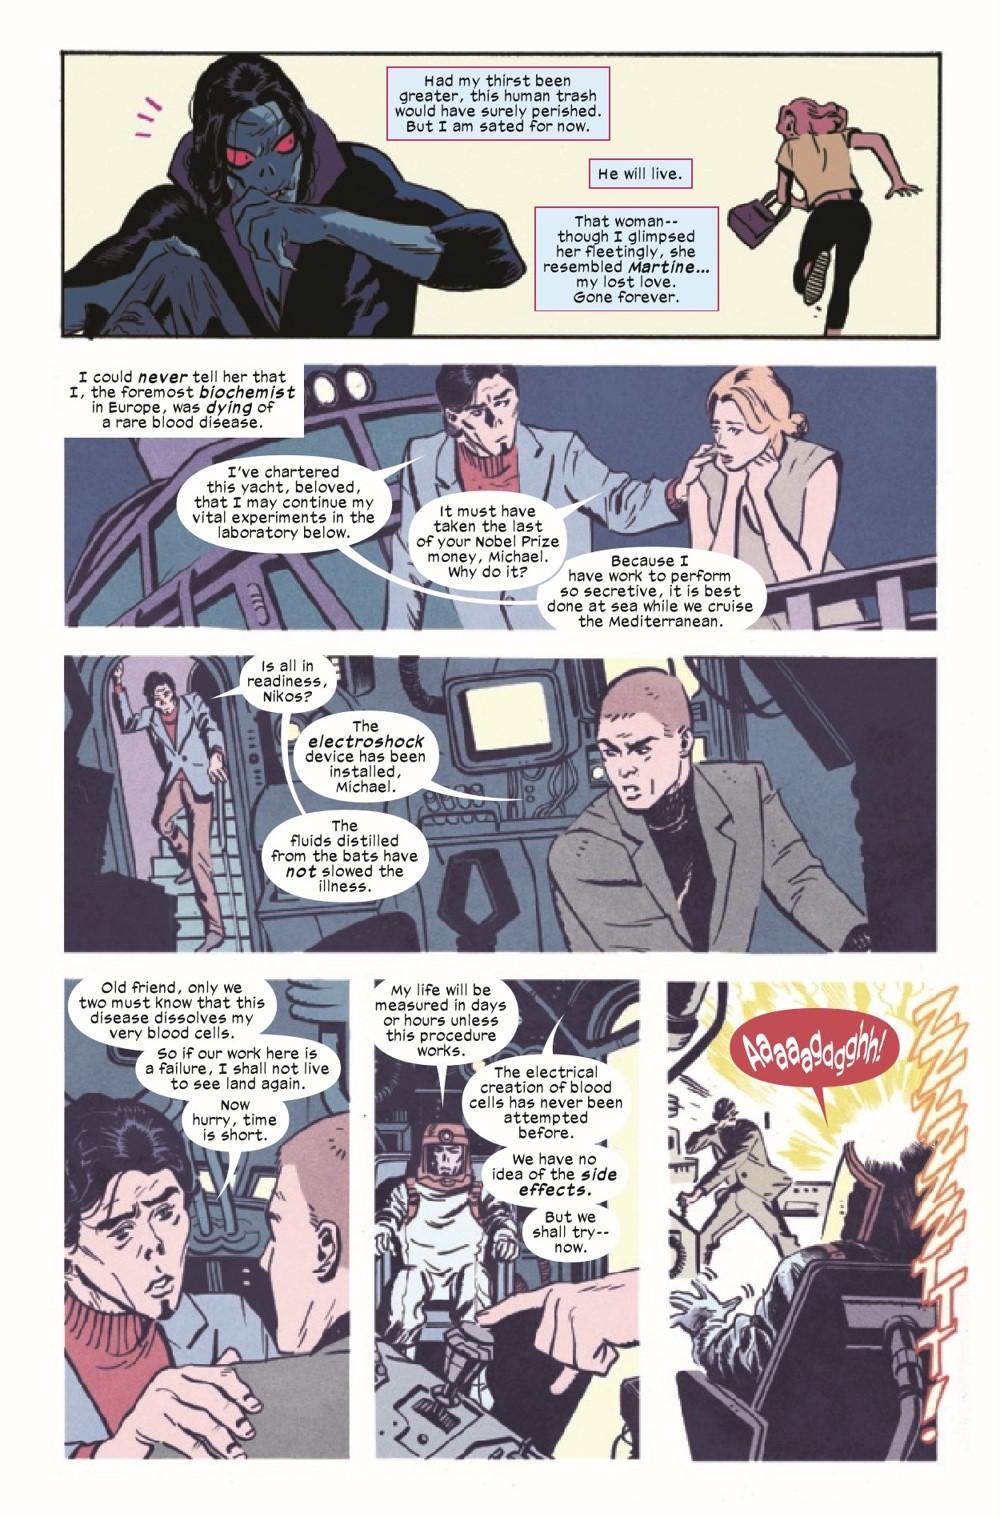 MORBIUSBOB2021001_Preview-4 ComicList Previews: MORBIUS BOND OF BLOOD #1